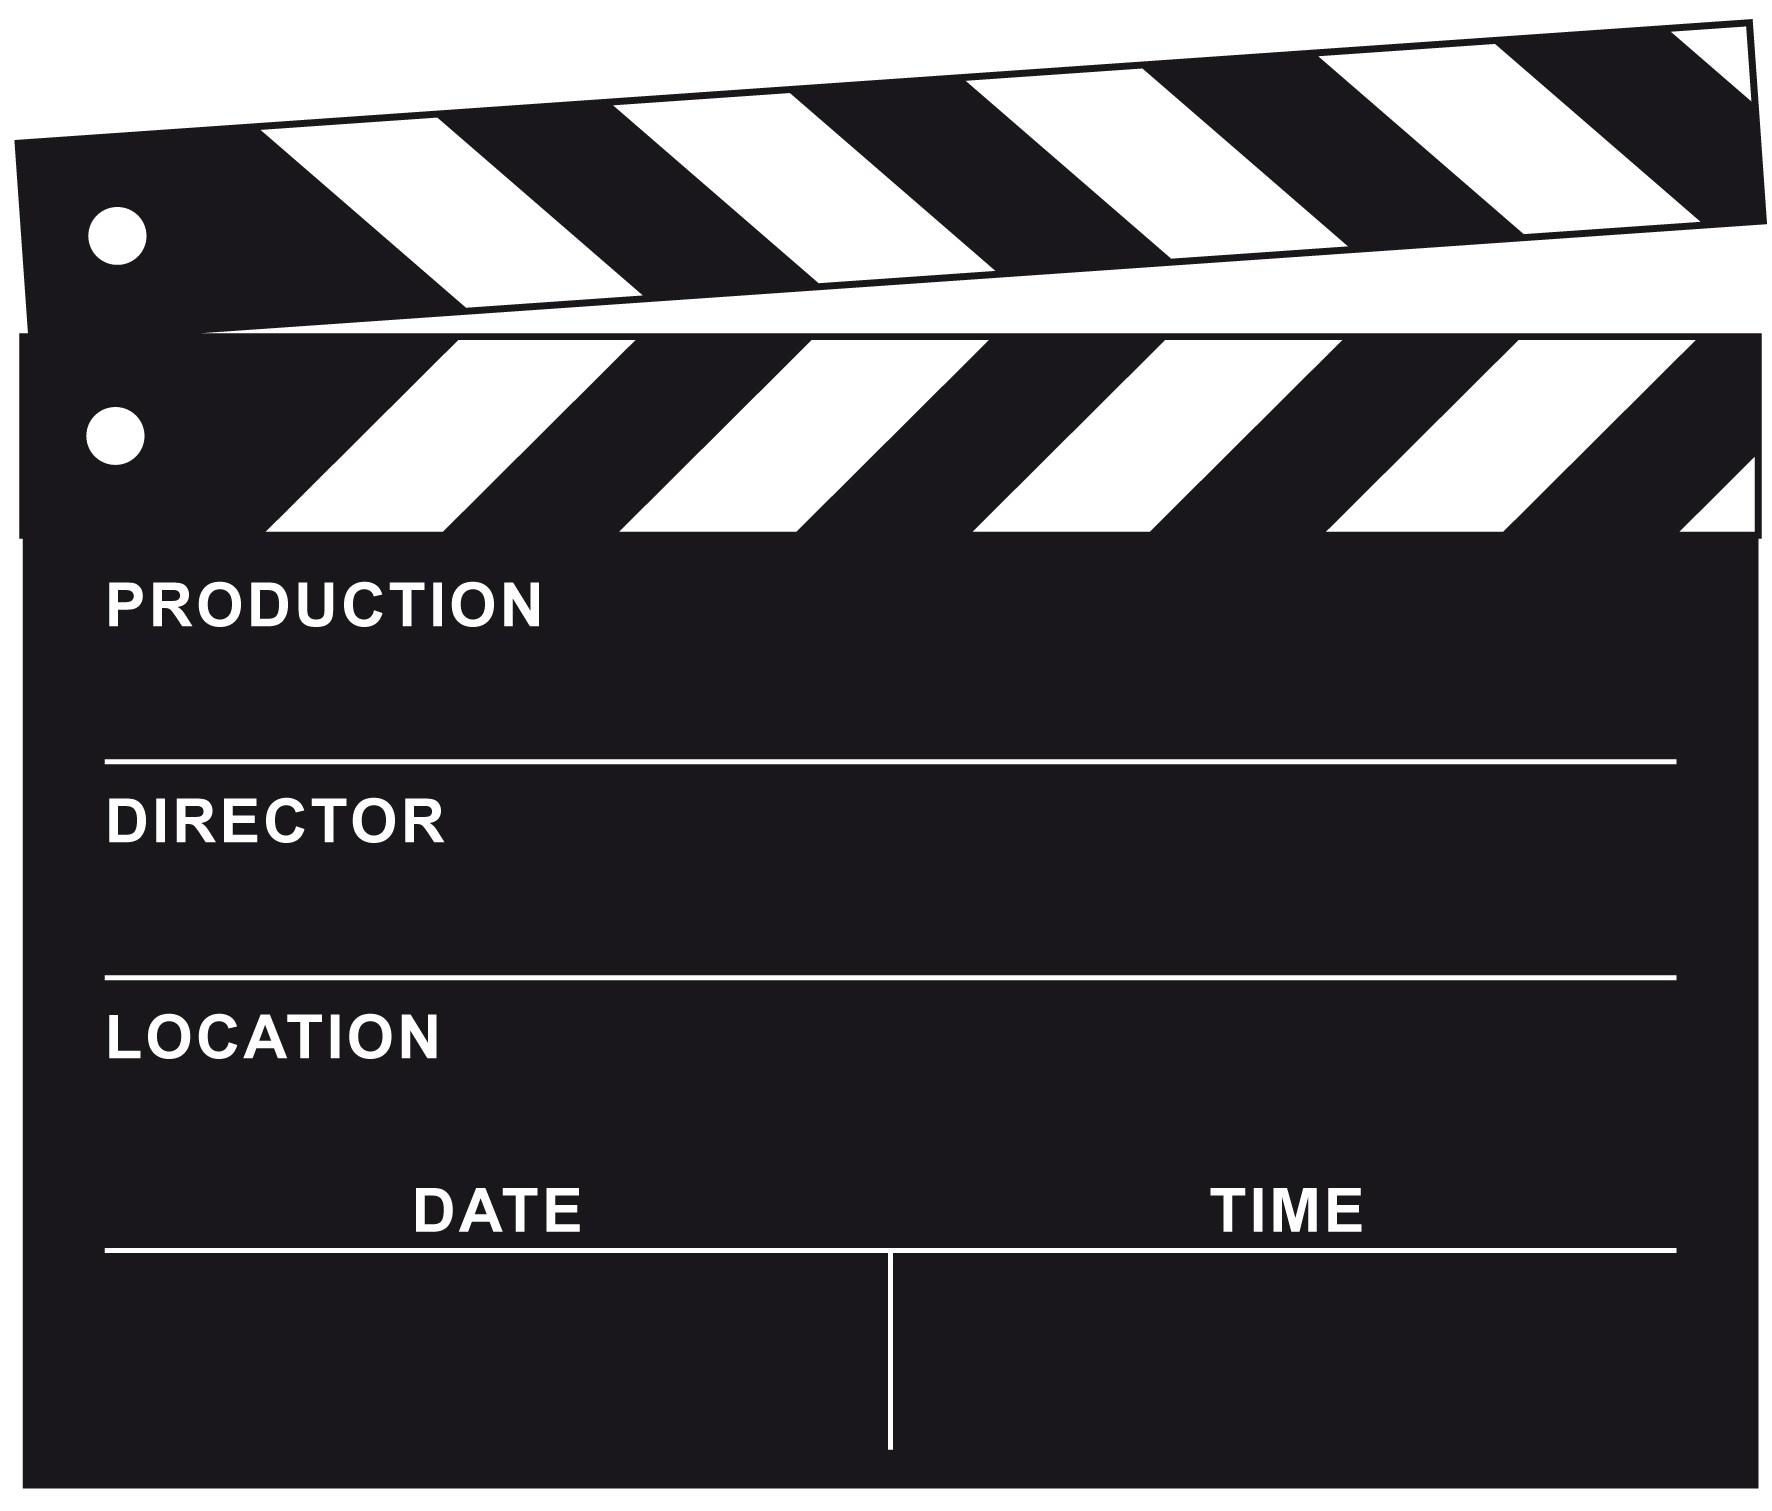 Filmklappe clipart 4 » Clipart Portal.